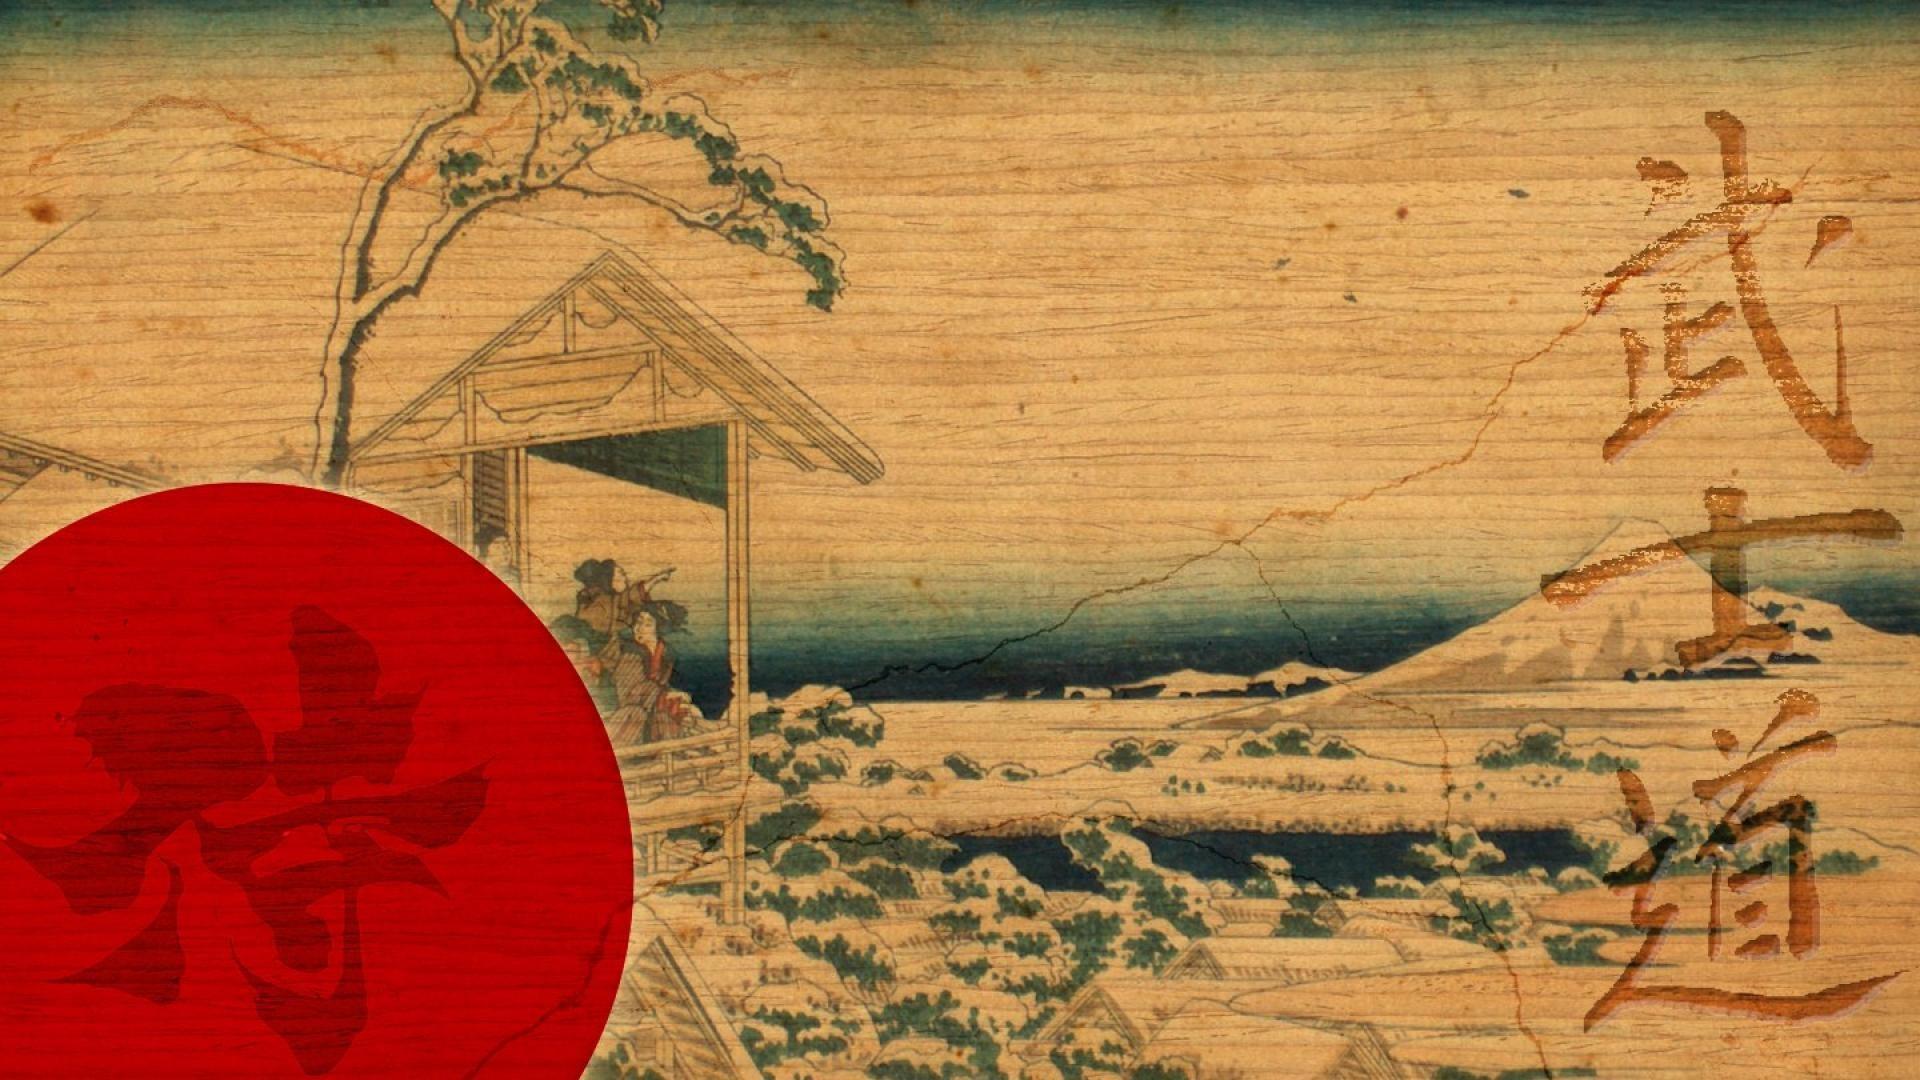 Res: 1920x1080, japanese art hd wallpaper - (#12791) - HQ Desktop Wallpapers .